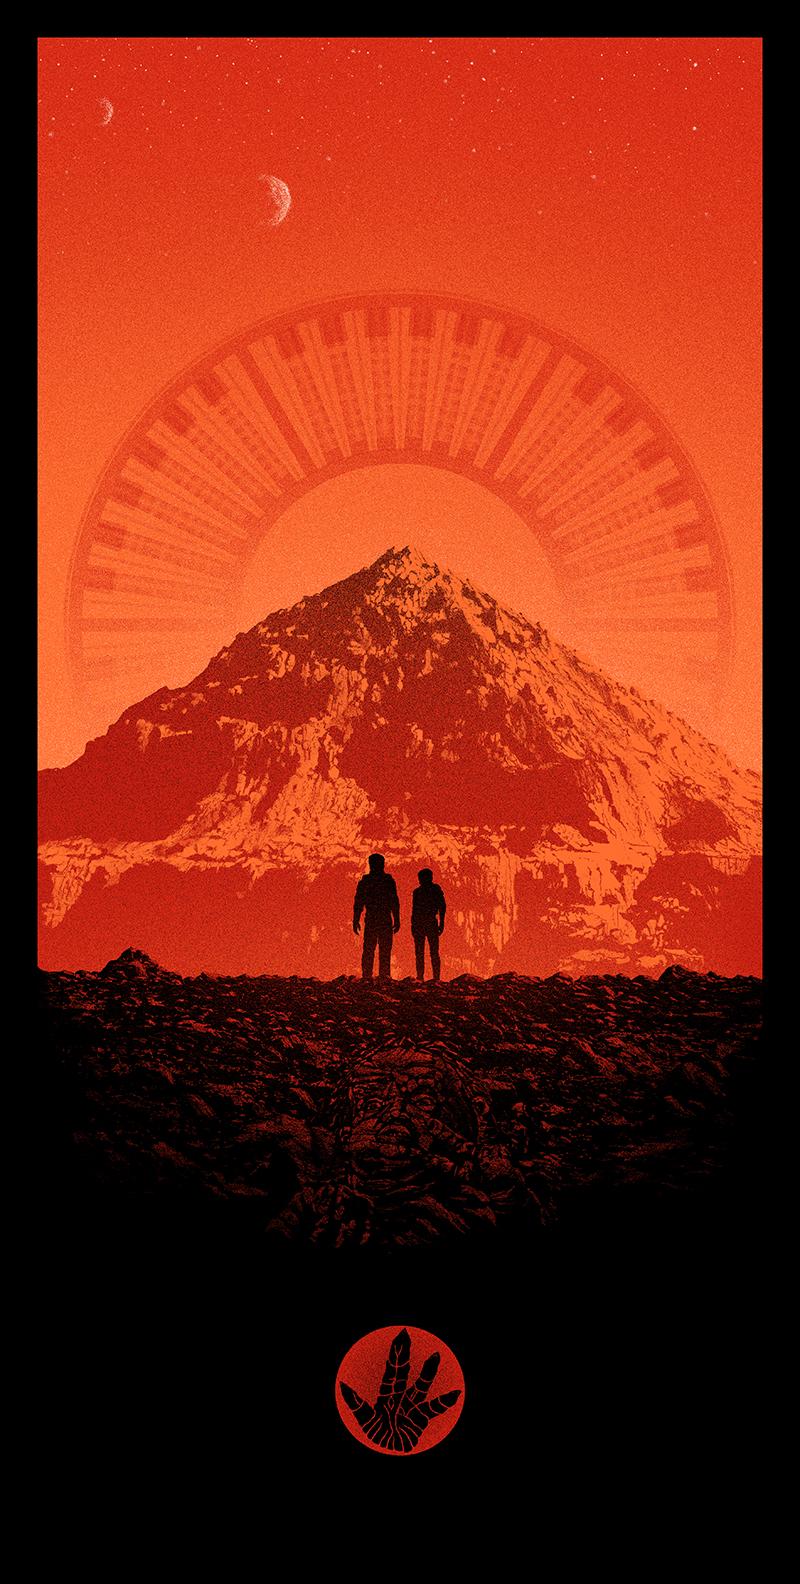 stunning-poster-art-for-iconic-movies-by-matt-fergusontotal-recall.jpg